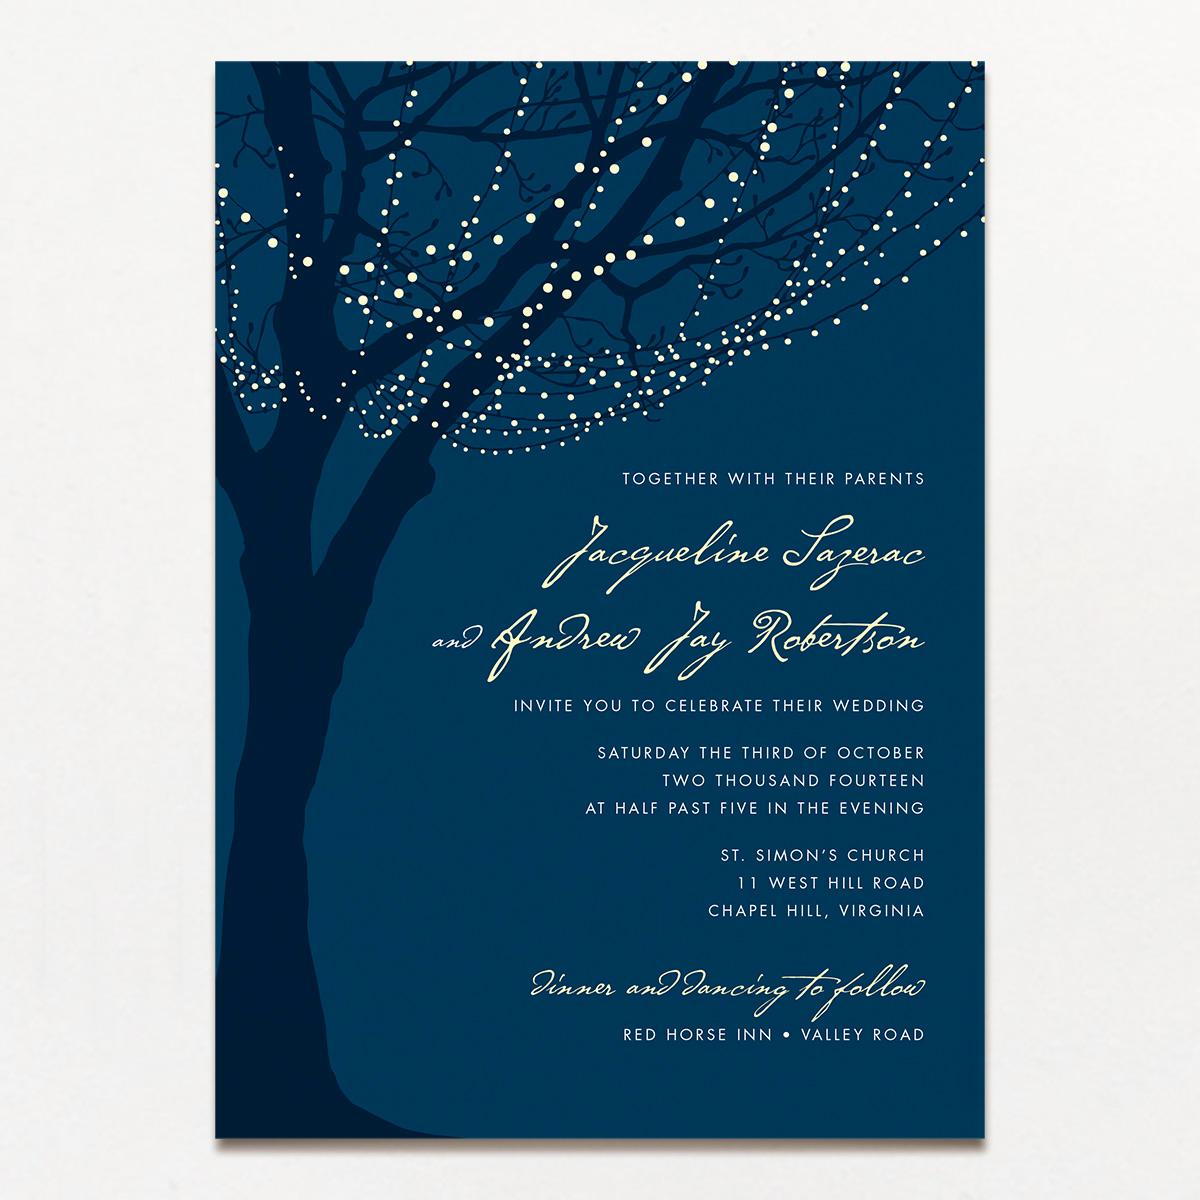 Wedding Invitation Graphic Design Beautiful Graphic Design 101 the tools Of the Trade